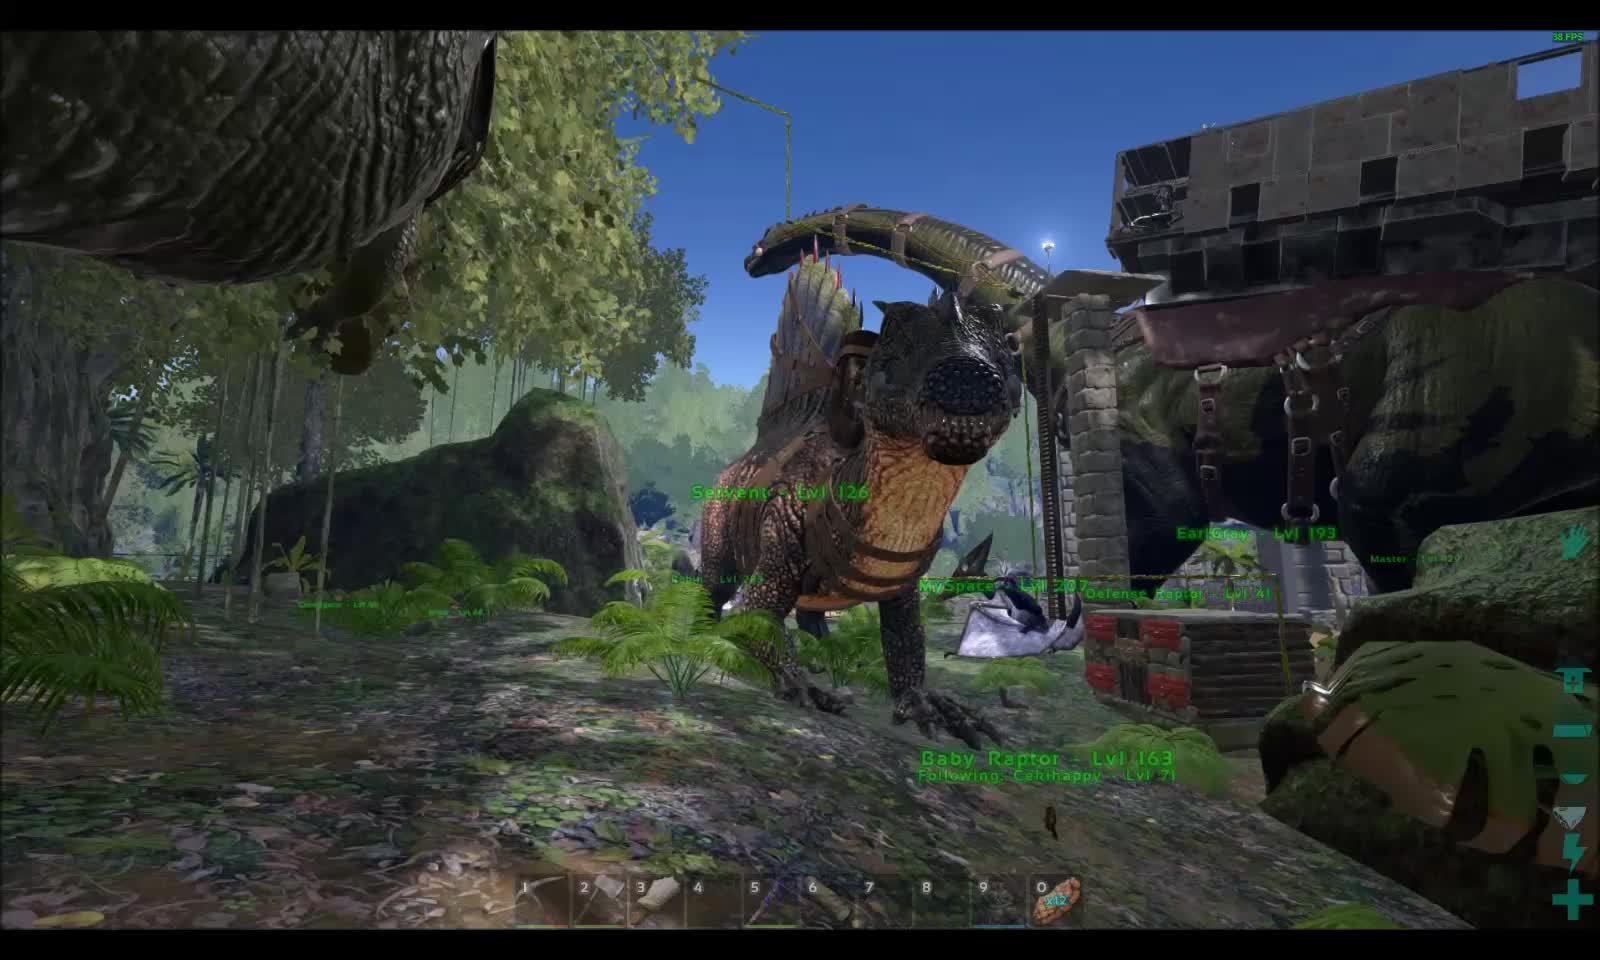 ark, playark, Baby Raptor Size refrence GIFs